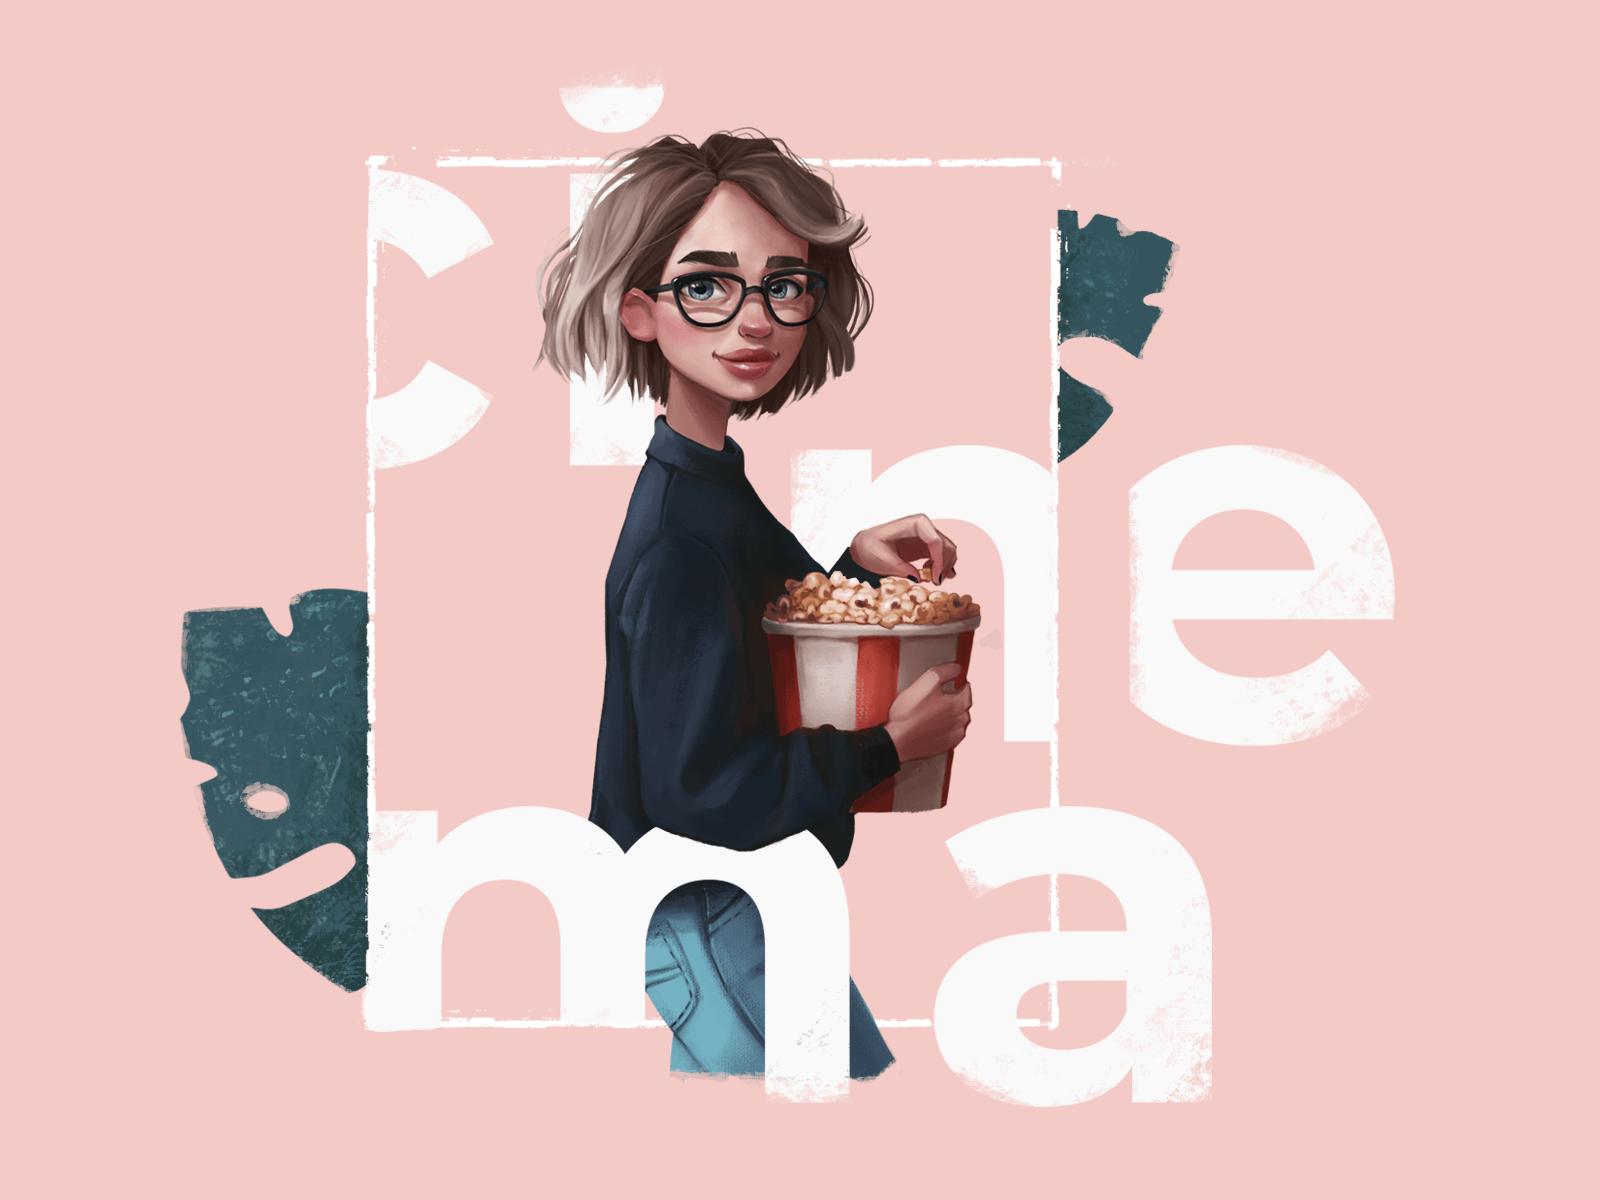 cinema fan illustration